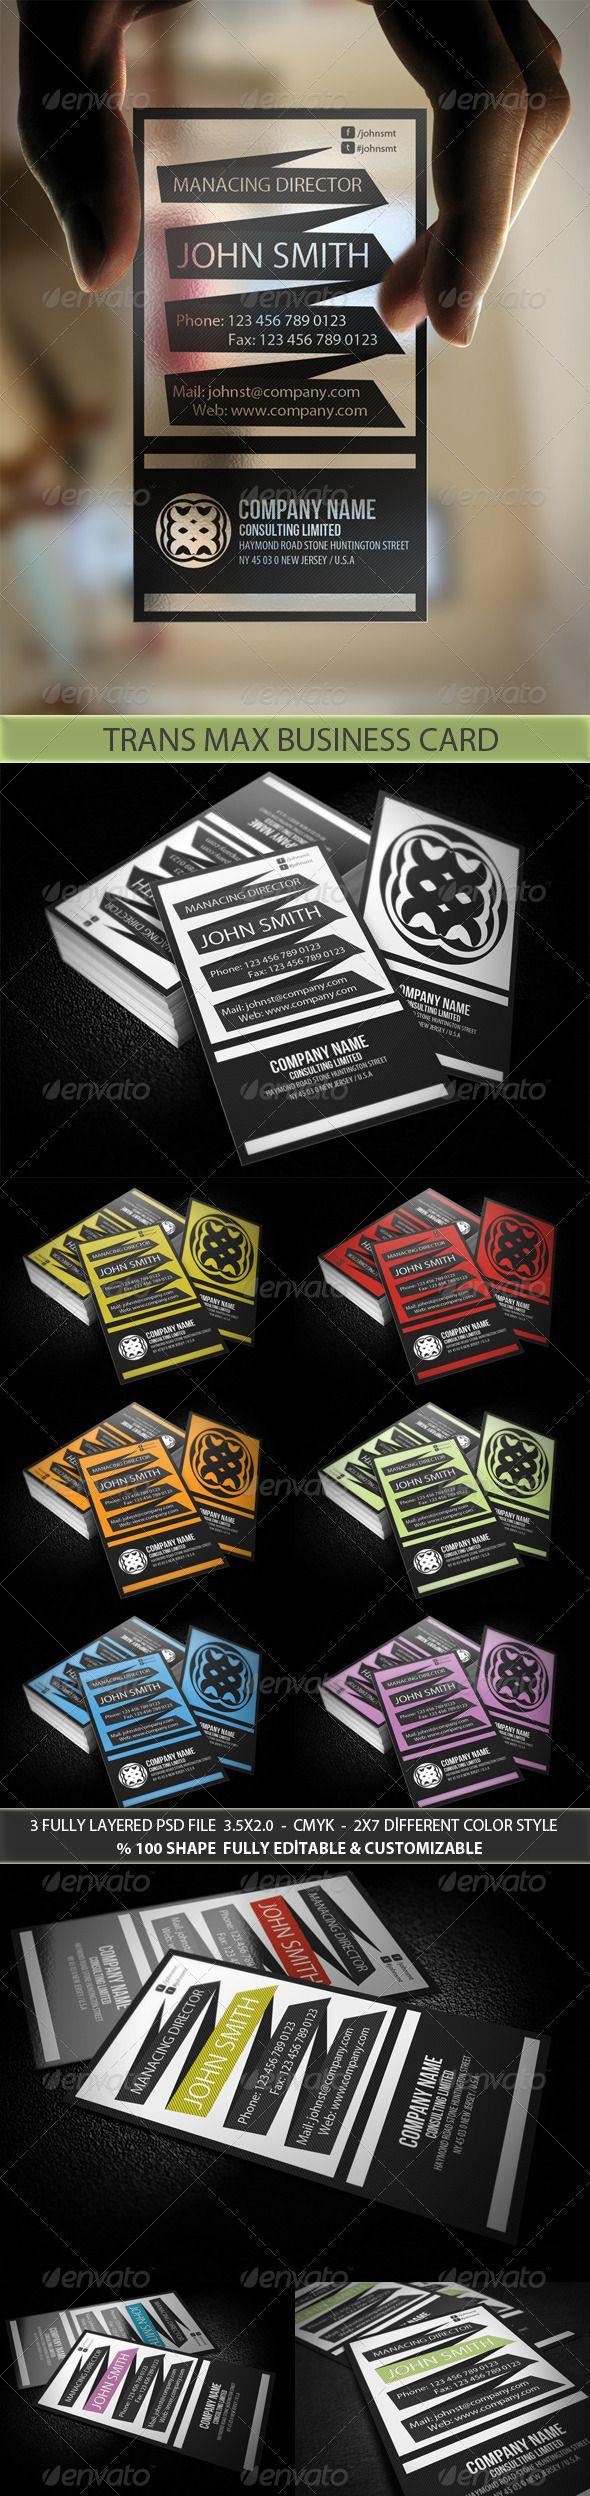 tarjetas de visita transparentes http://www.bce-online.com/es